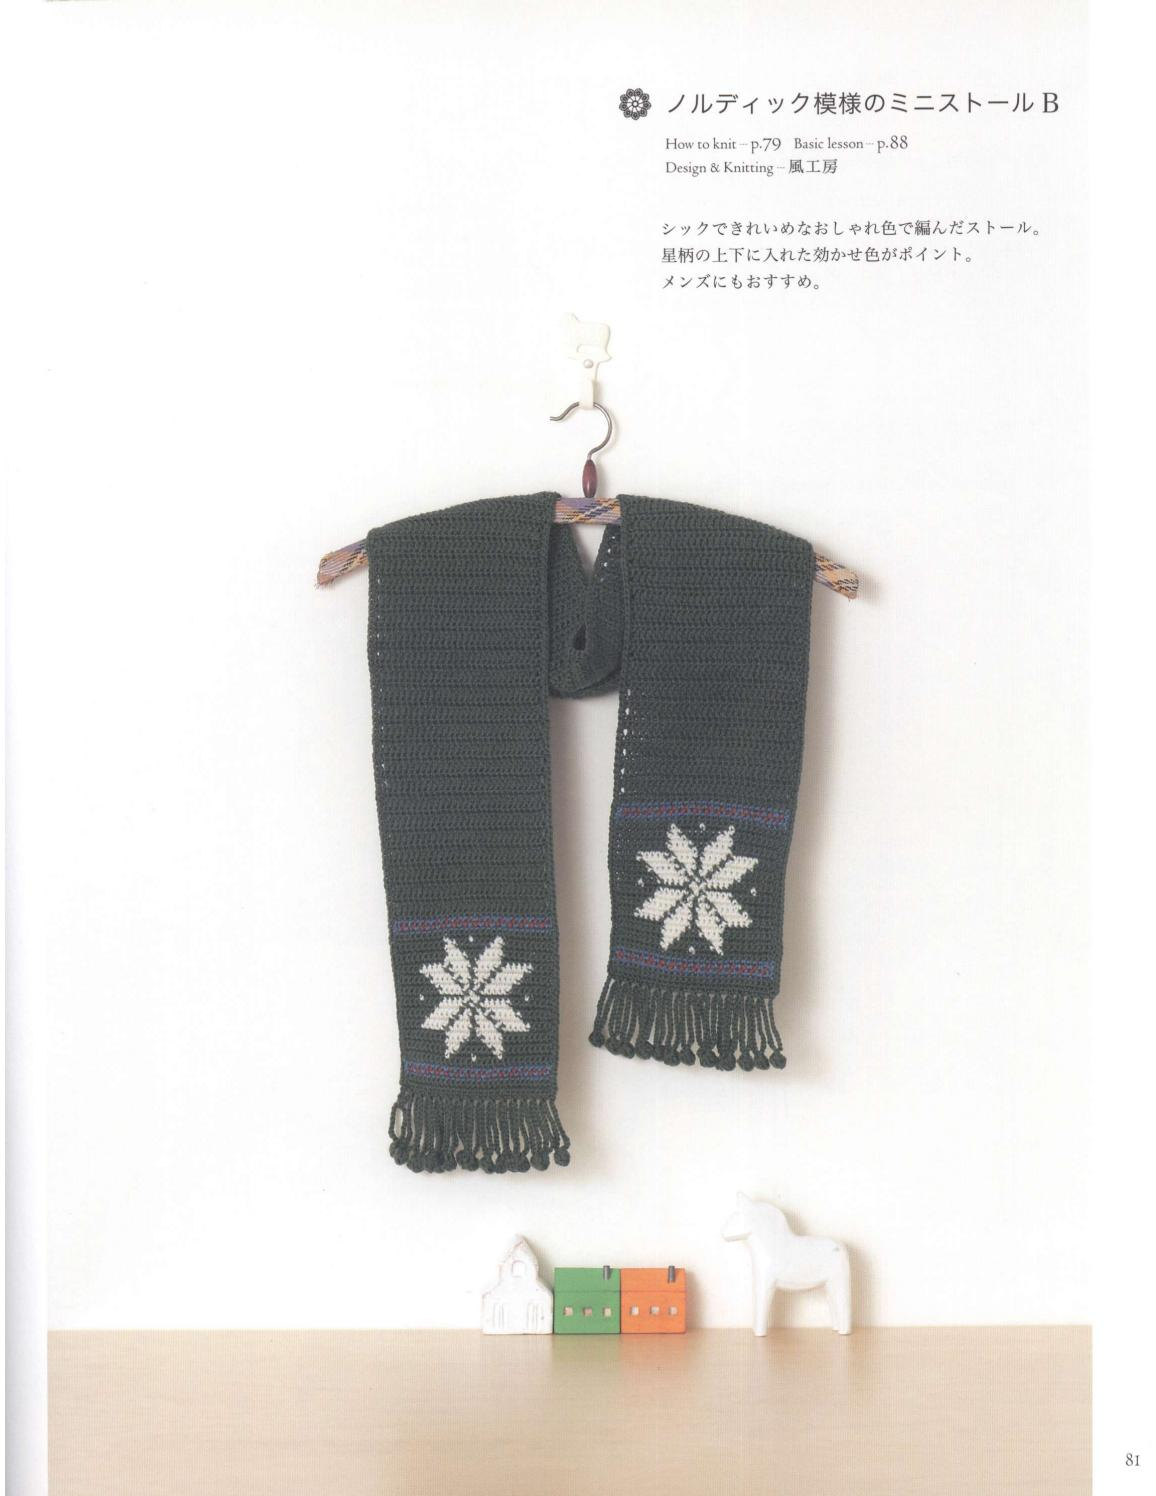 Asahi original crochet best selection 2012 page 81